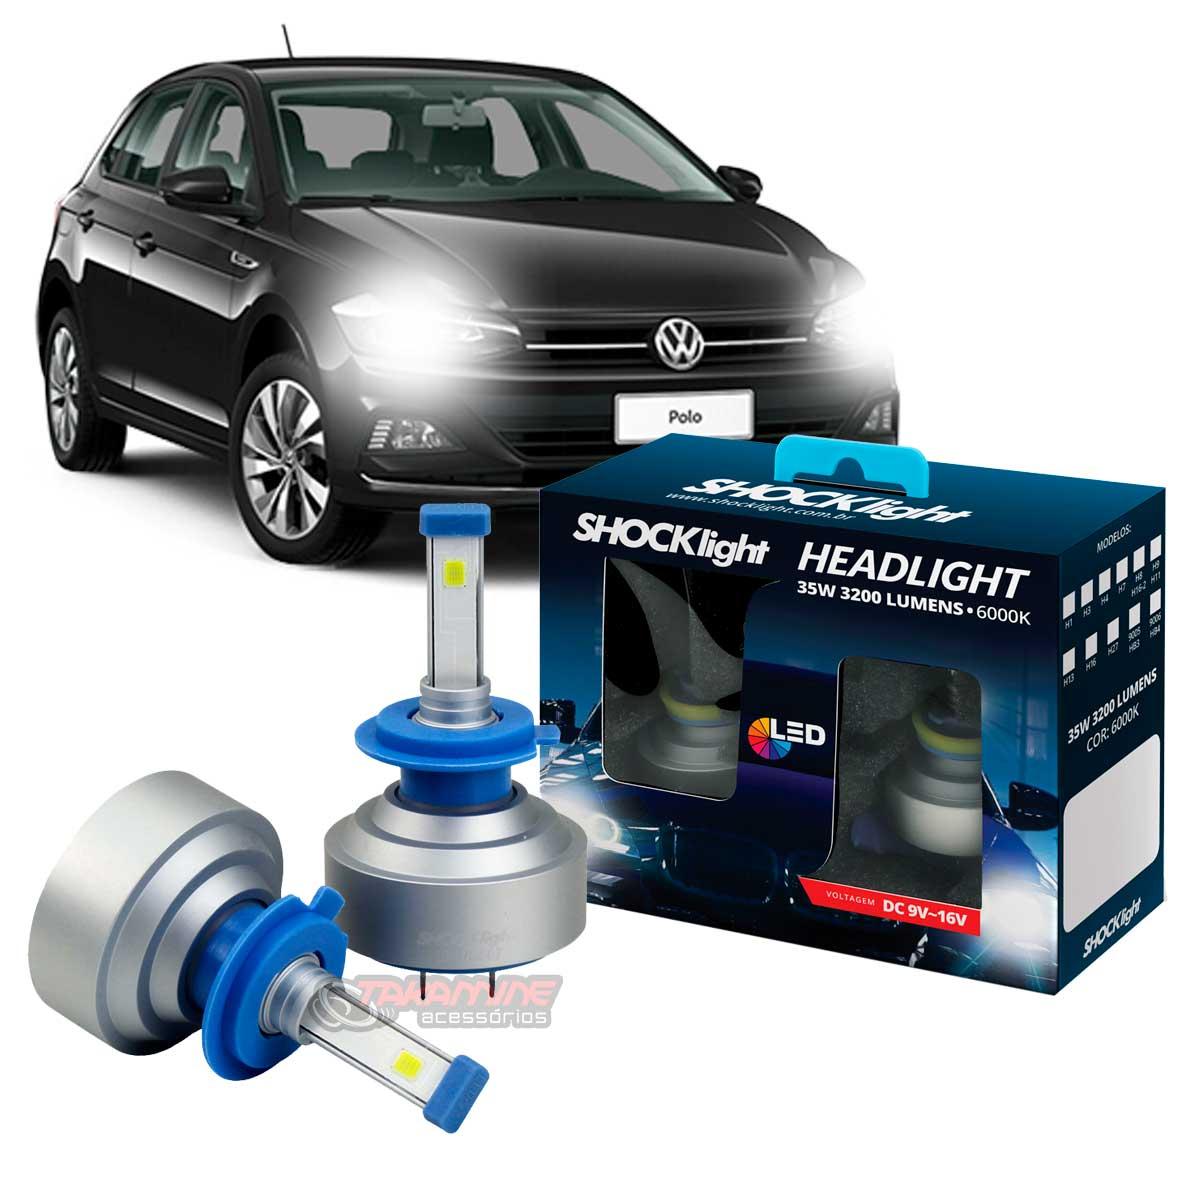 Kit LED Polo 2018 2019 2020 tipo xenon modelo H7 35W encaixe original plug & play New Headlight